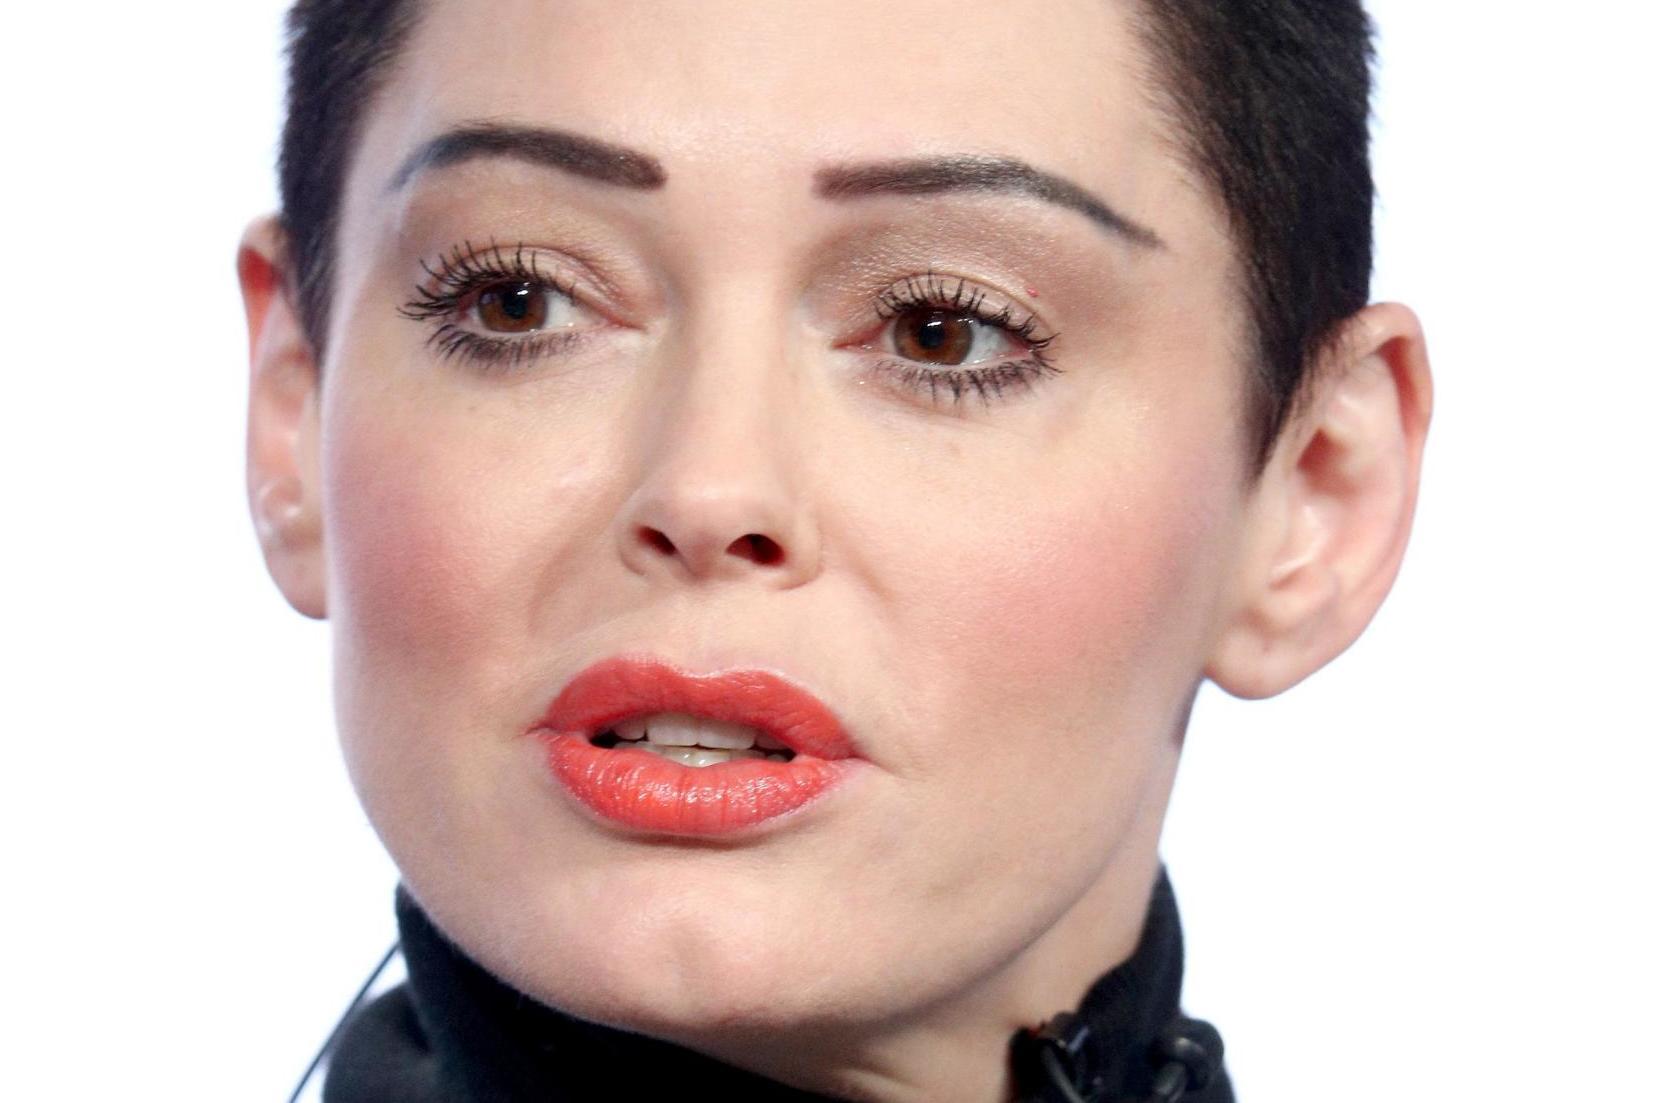 MeToo activist Rose McGowan to perform one-woman show at Edinburgh Fringe Festival